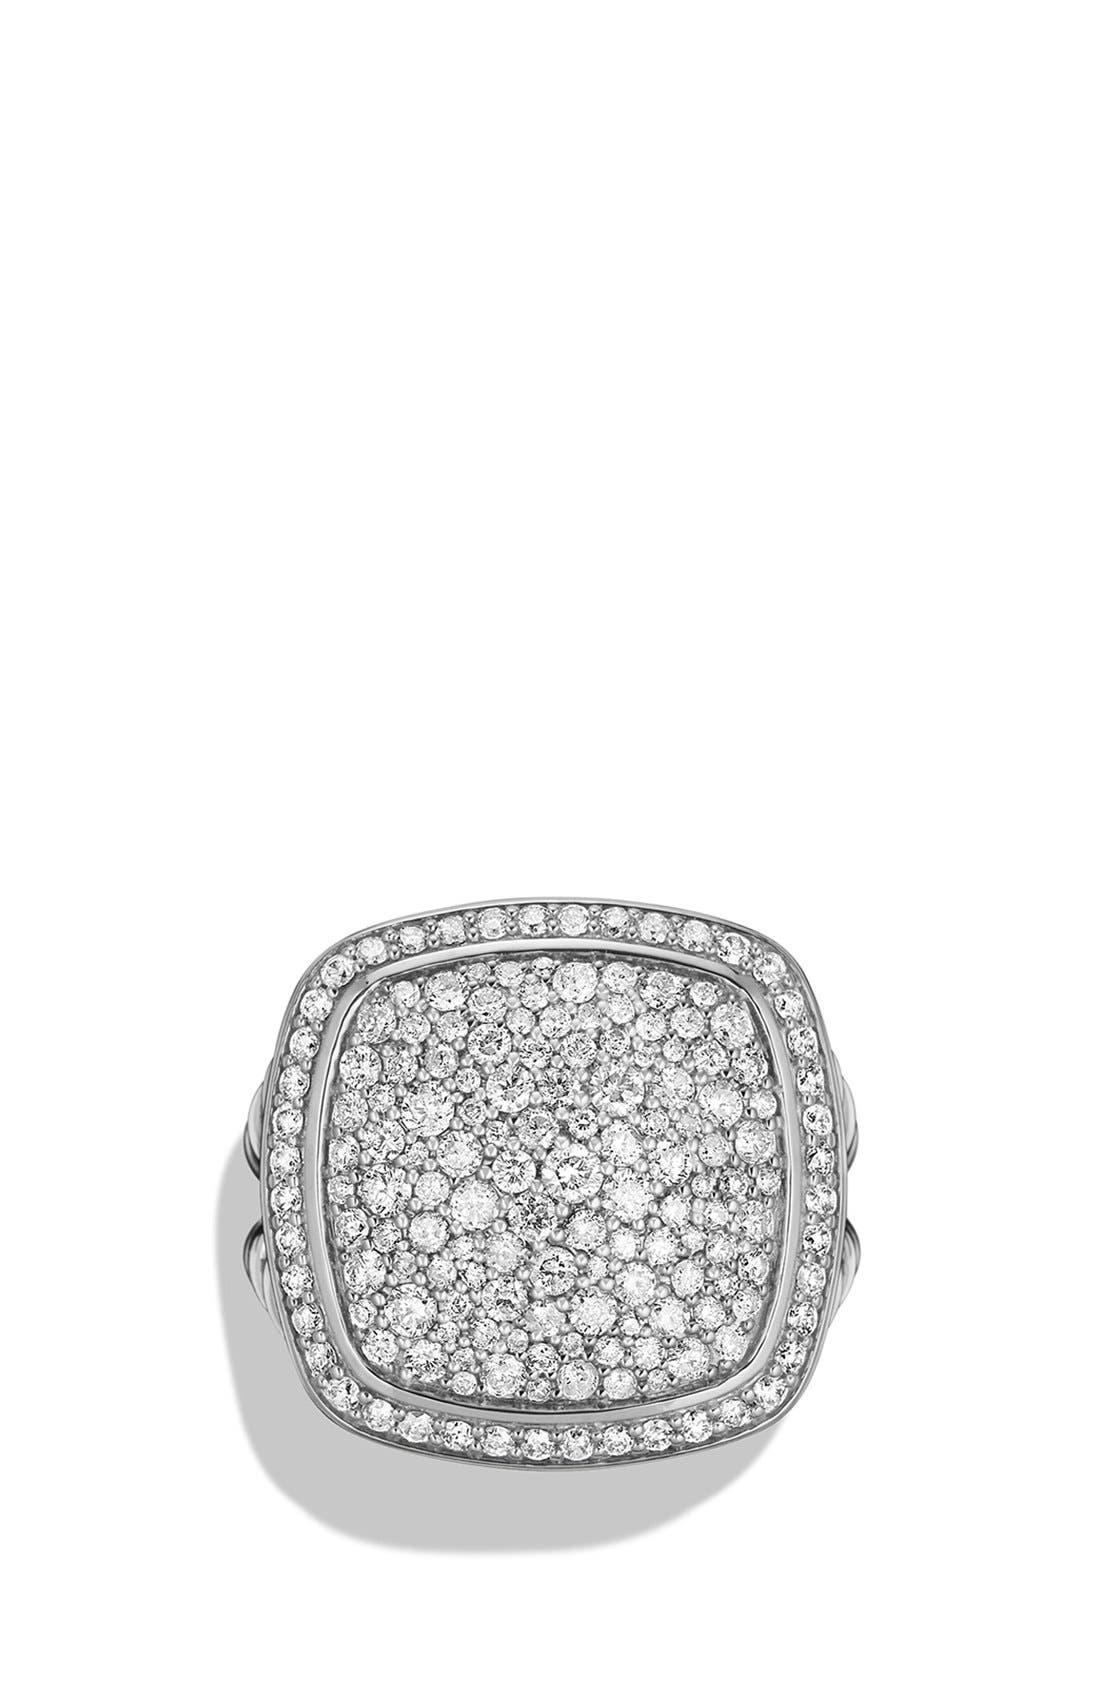 Albion Ring with Diamonds,                             Alternate thumbnail 4, color,                             DIAMOND